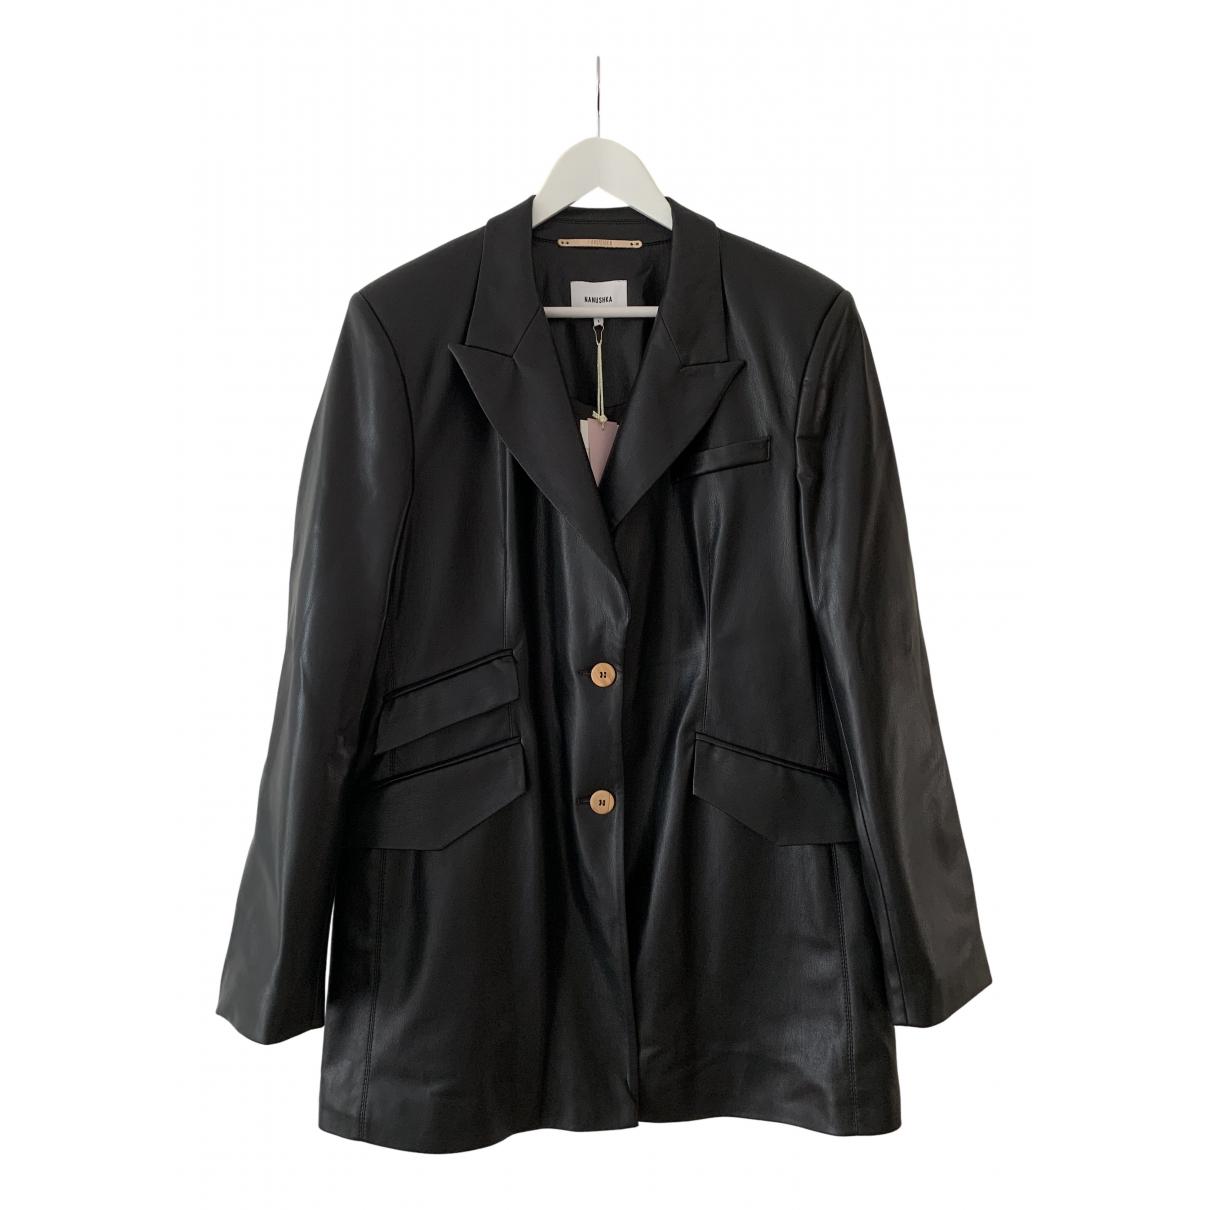 Nanushka \N Black jacket for Women L International